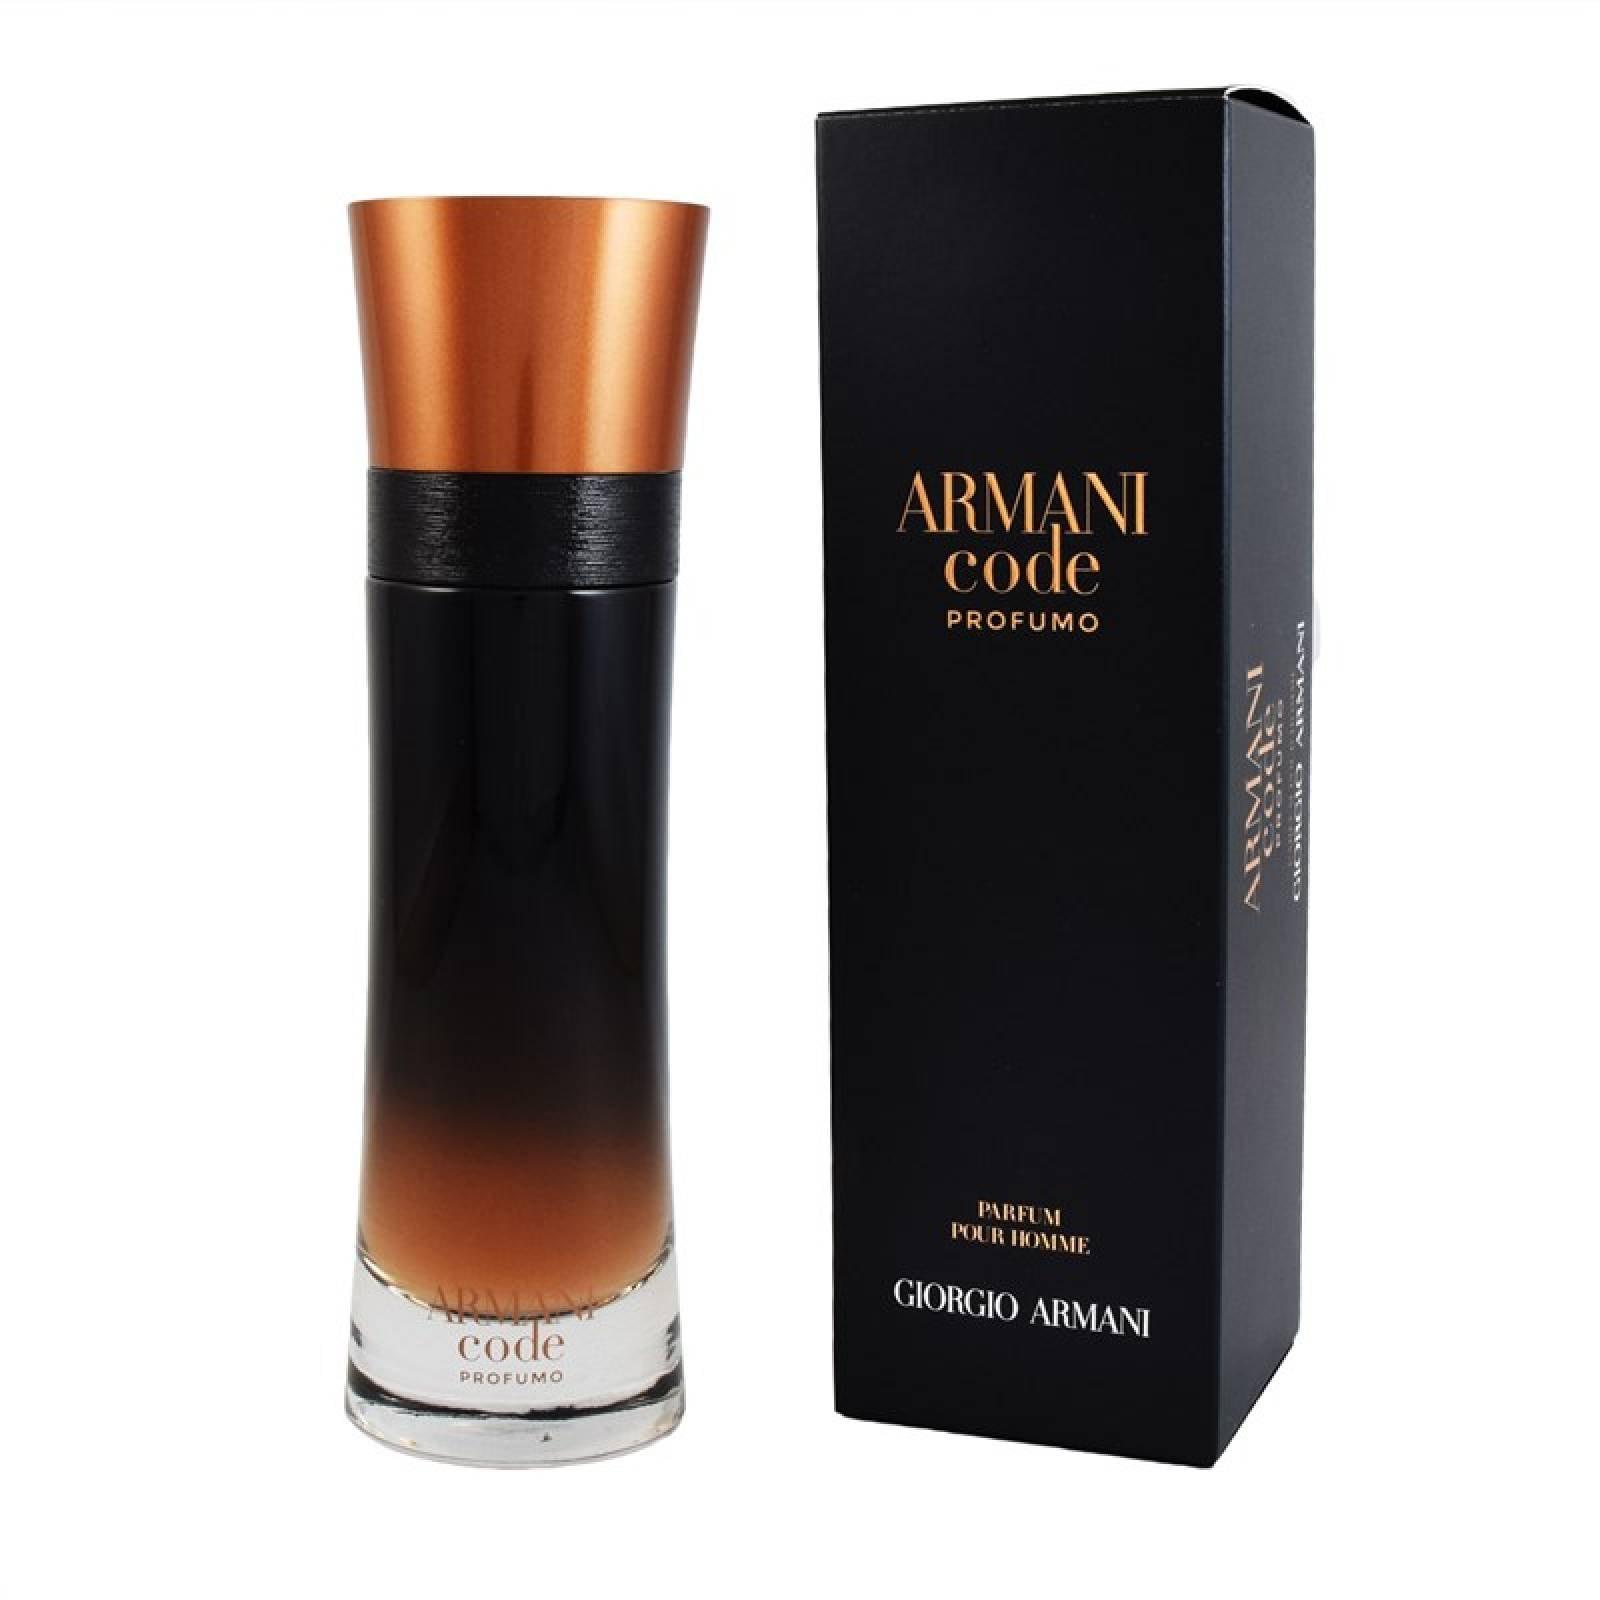 armani code profumo 110ml